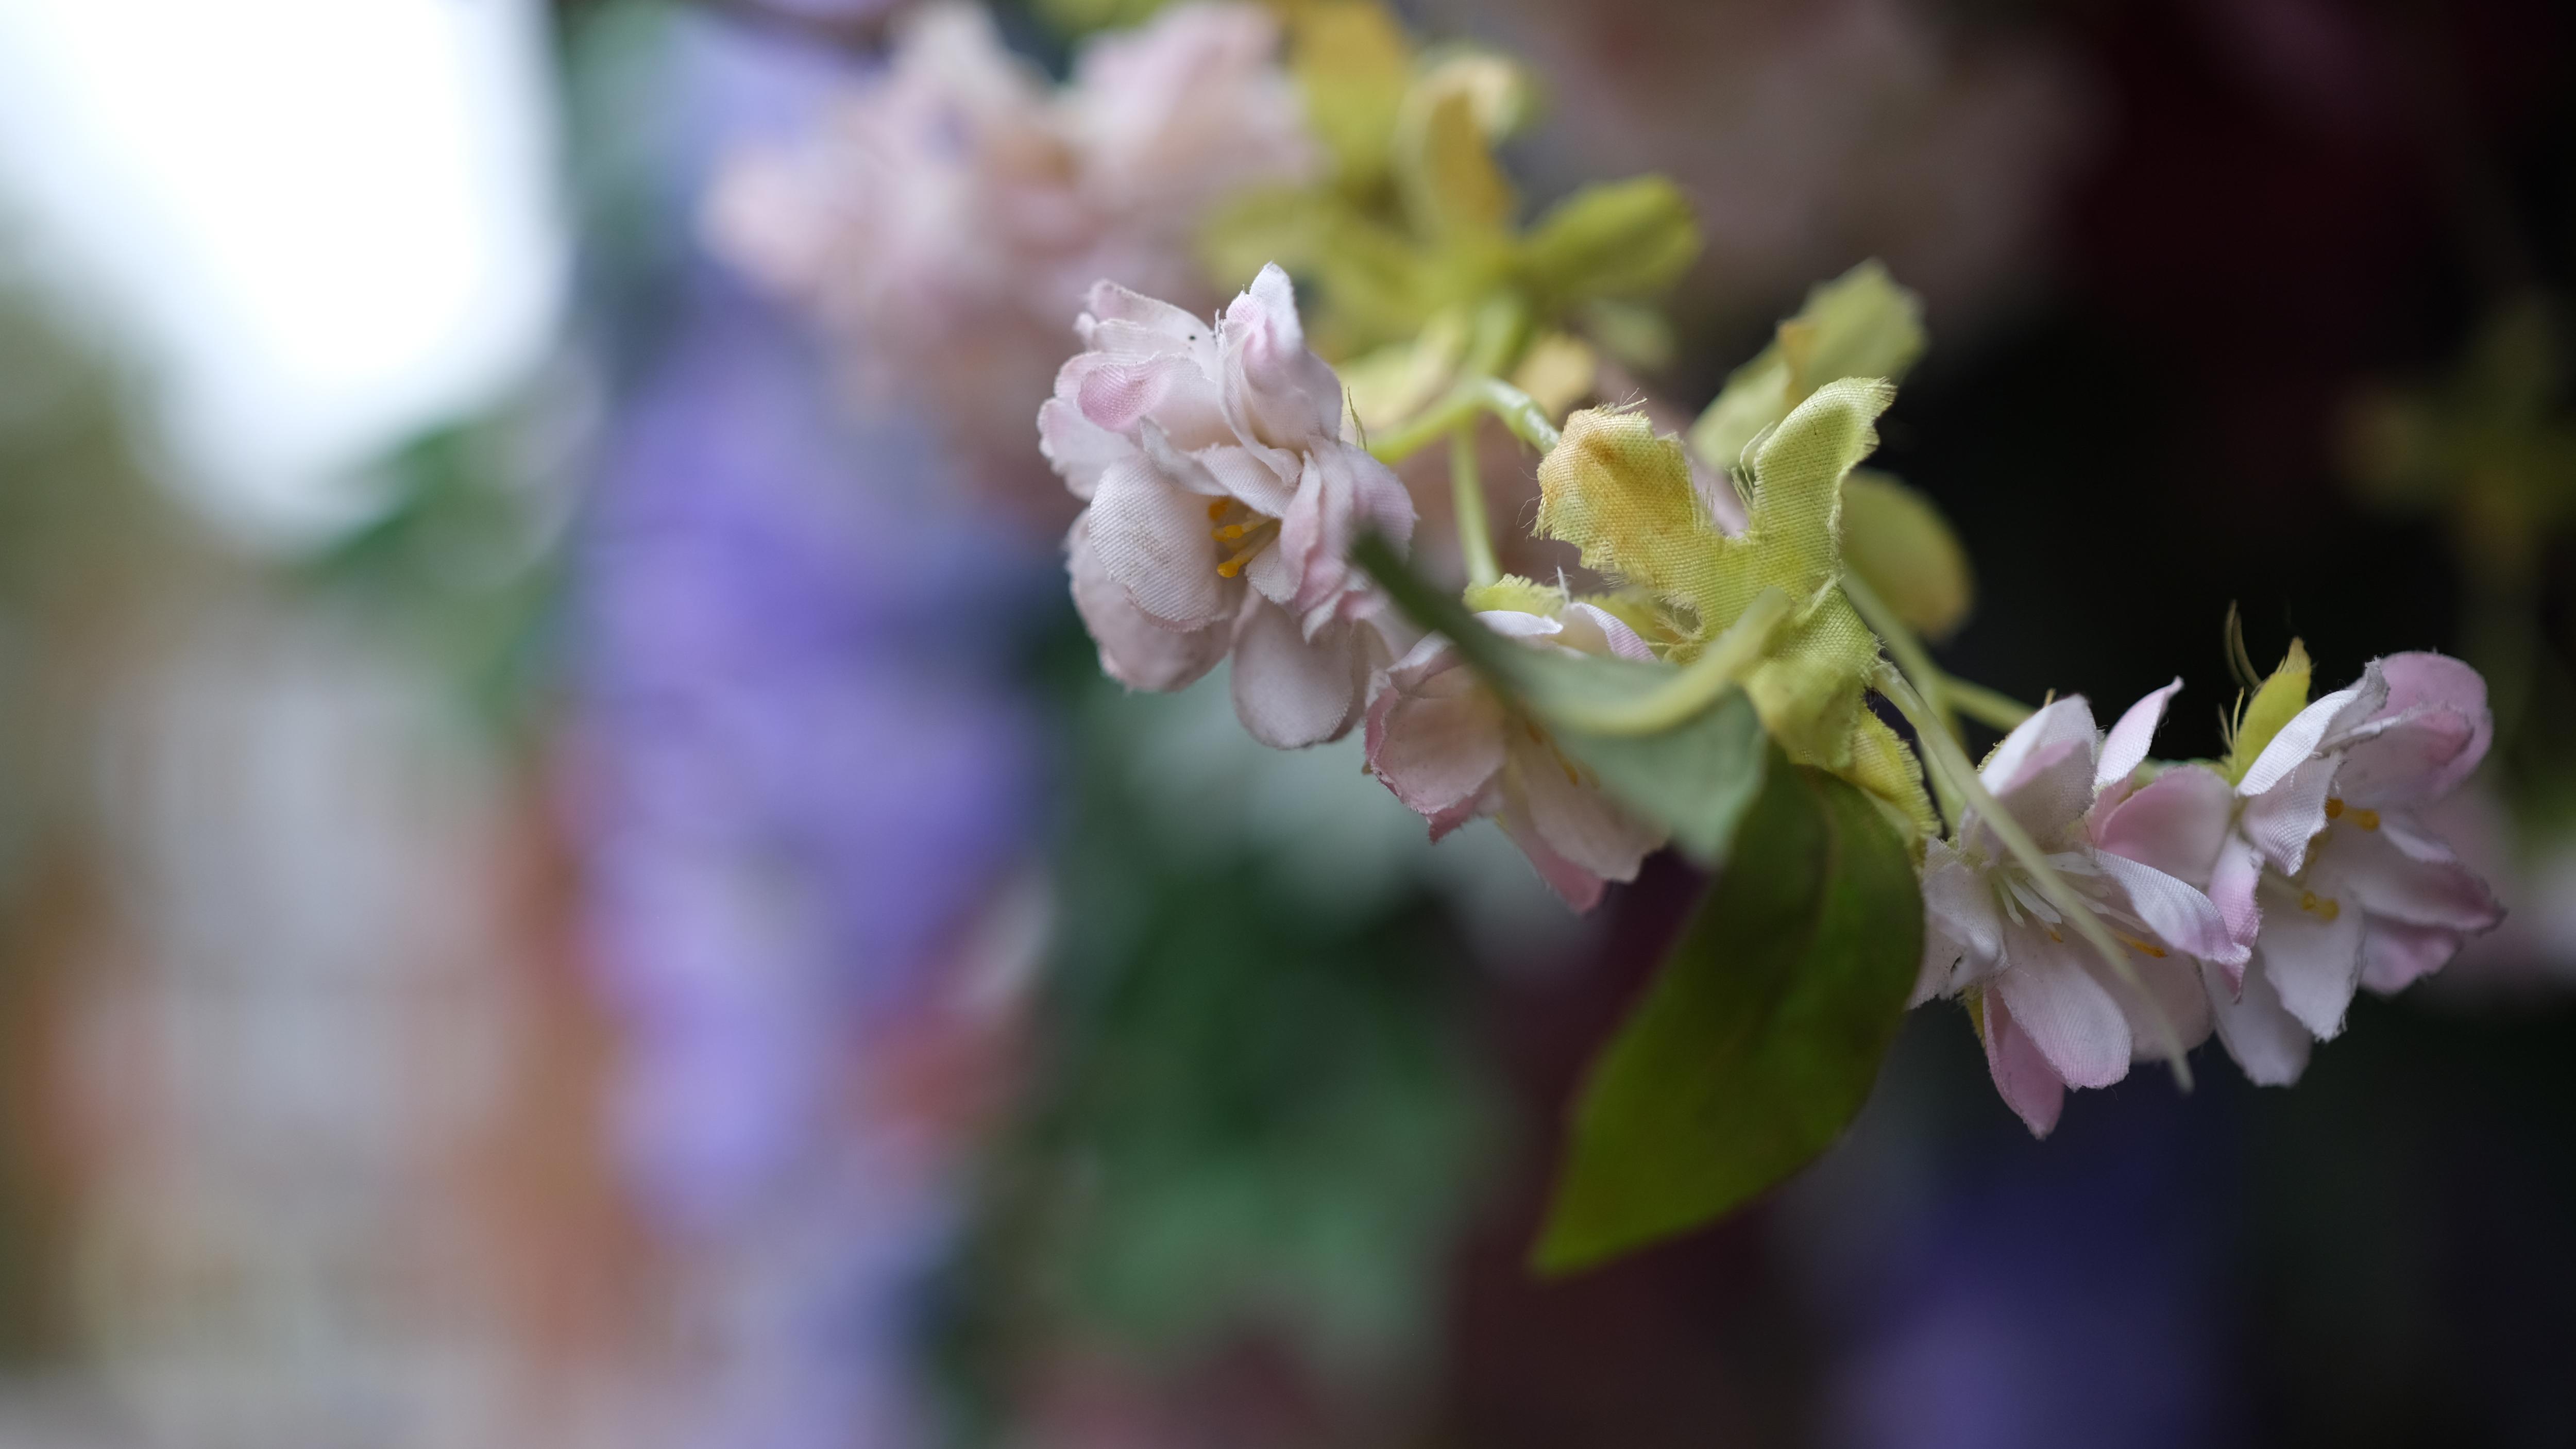 A fake flower in London's Trafalgar Square shot with the Fujifilm XF33mm f/1.4 lens